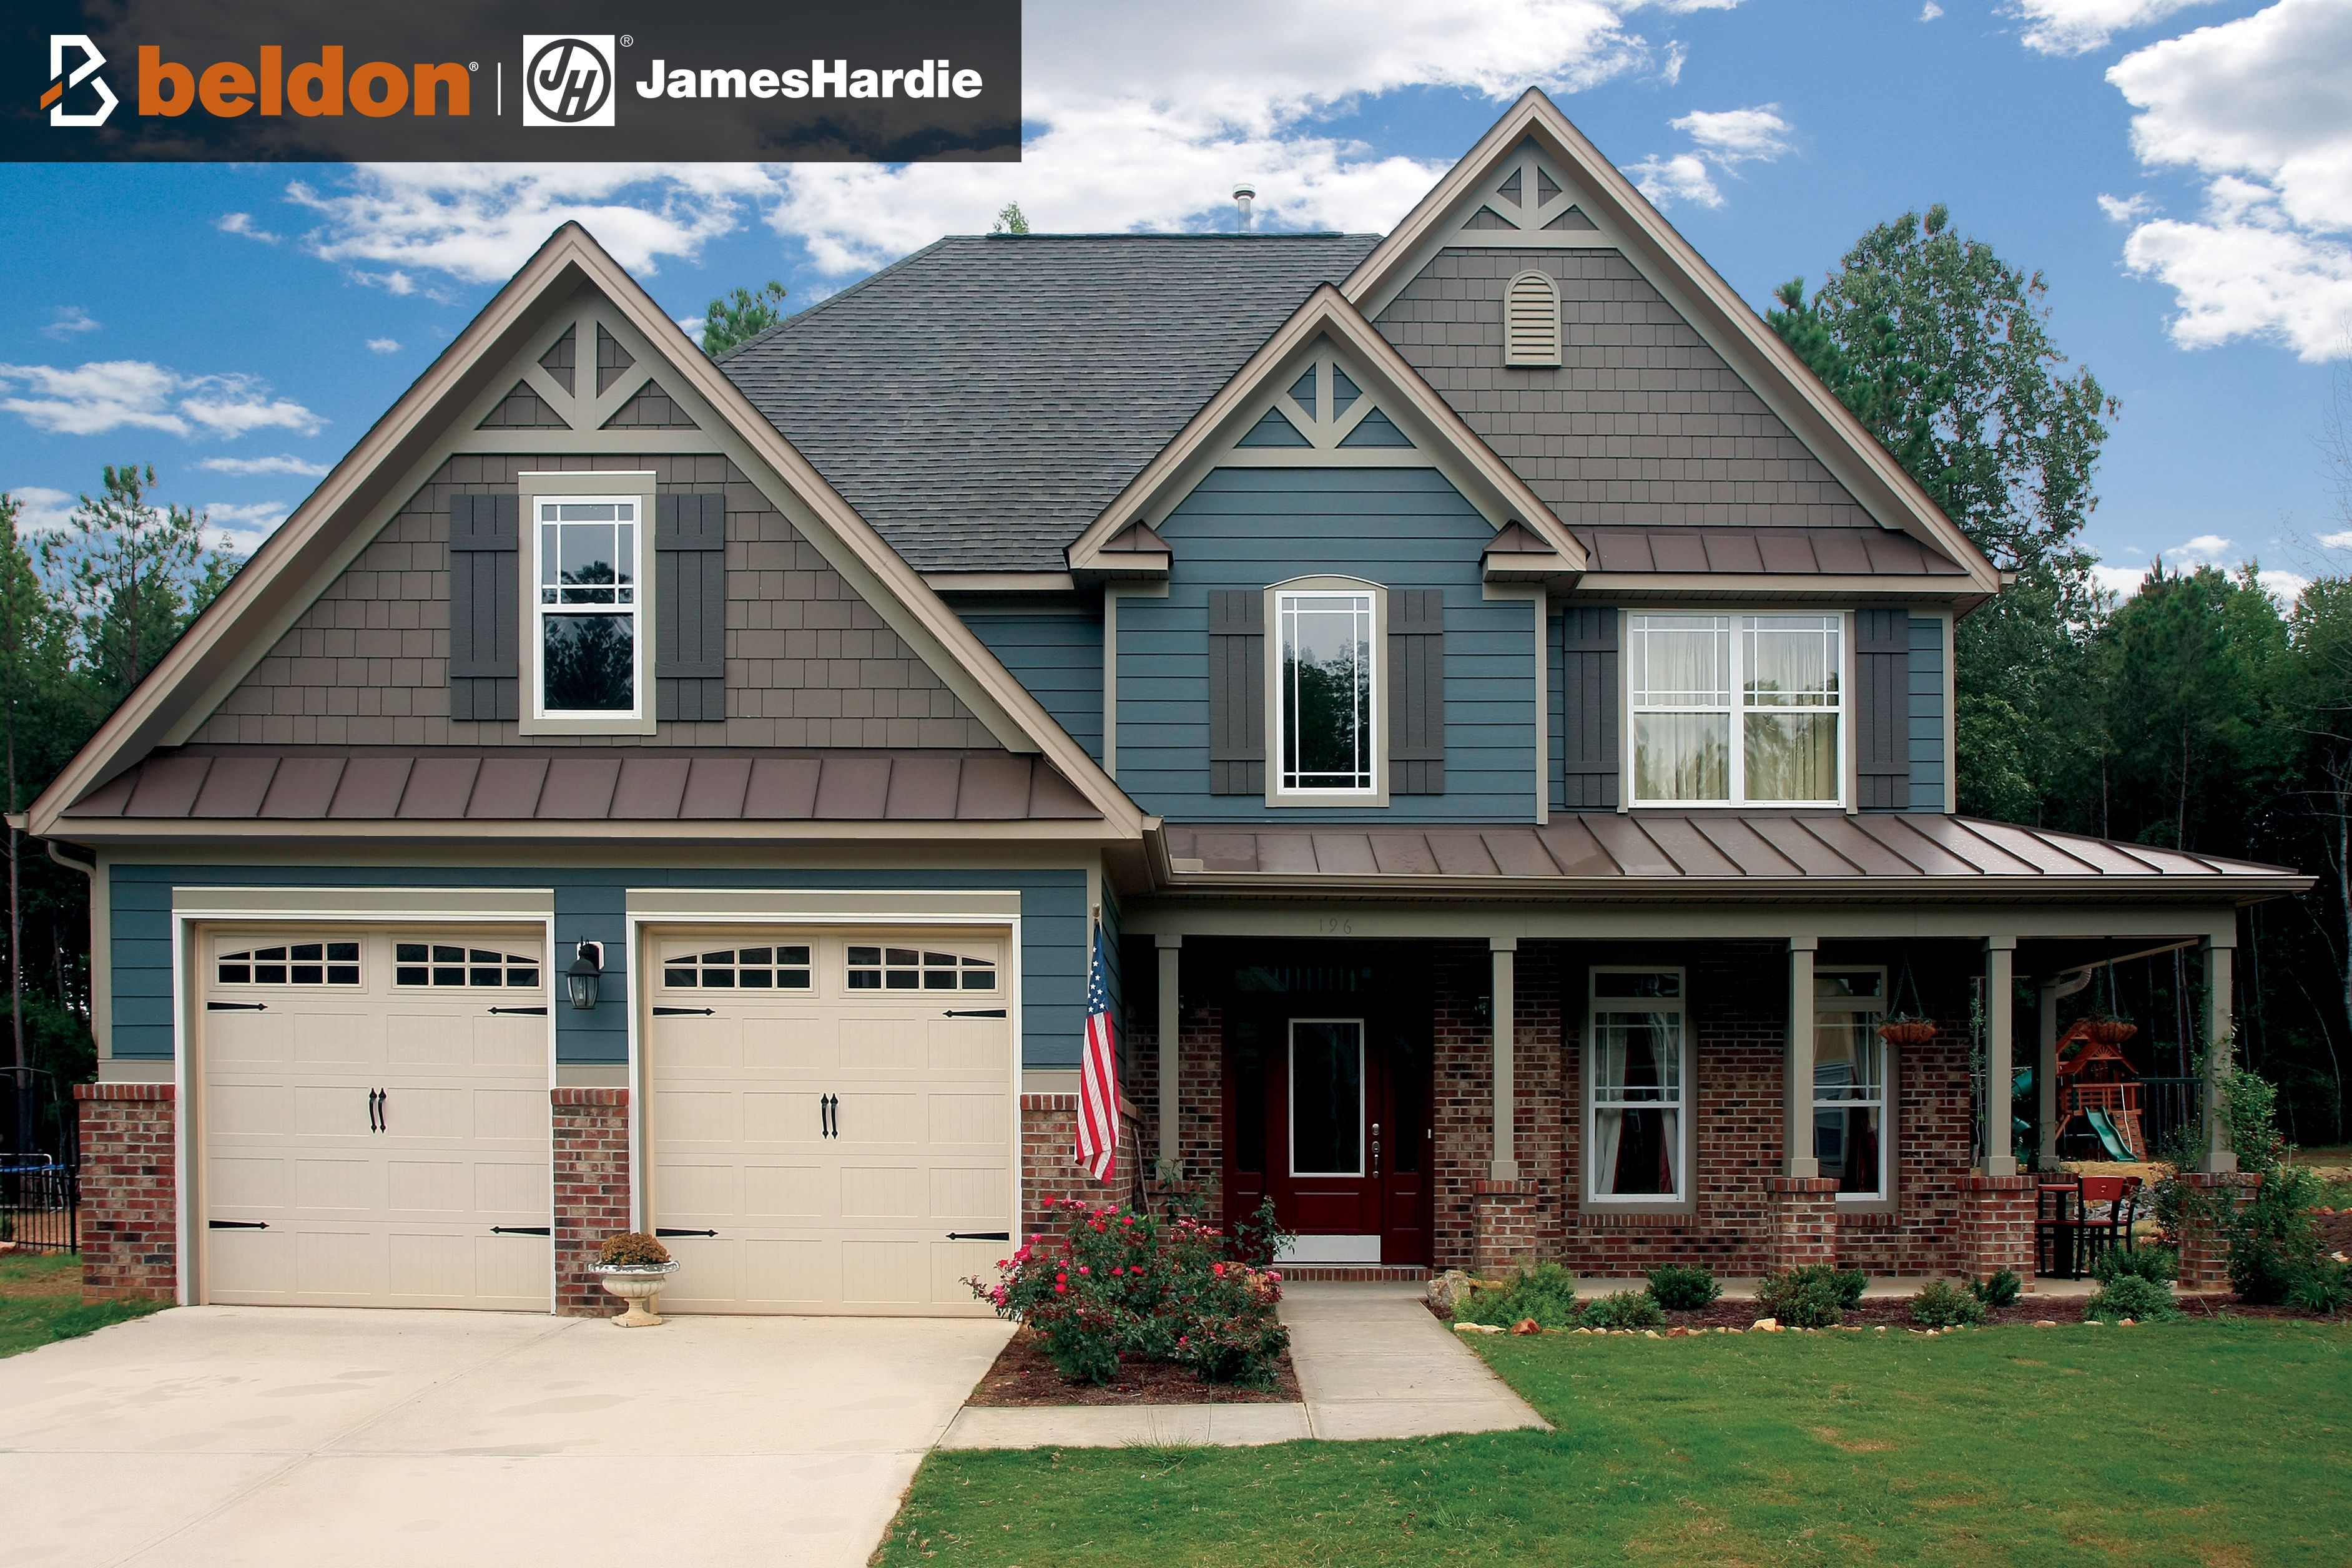 James Hardie Siding House Siding Blue Siding Hardie Siding